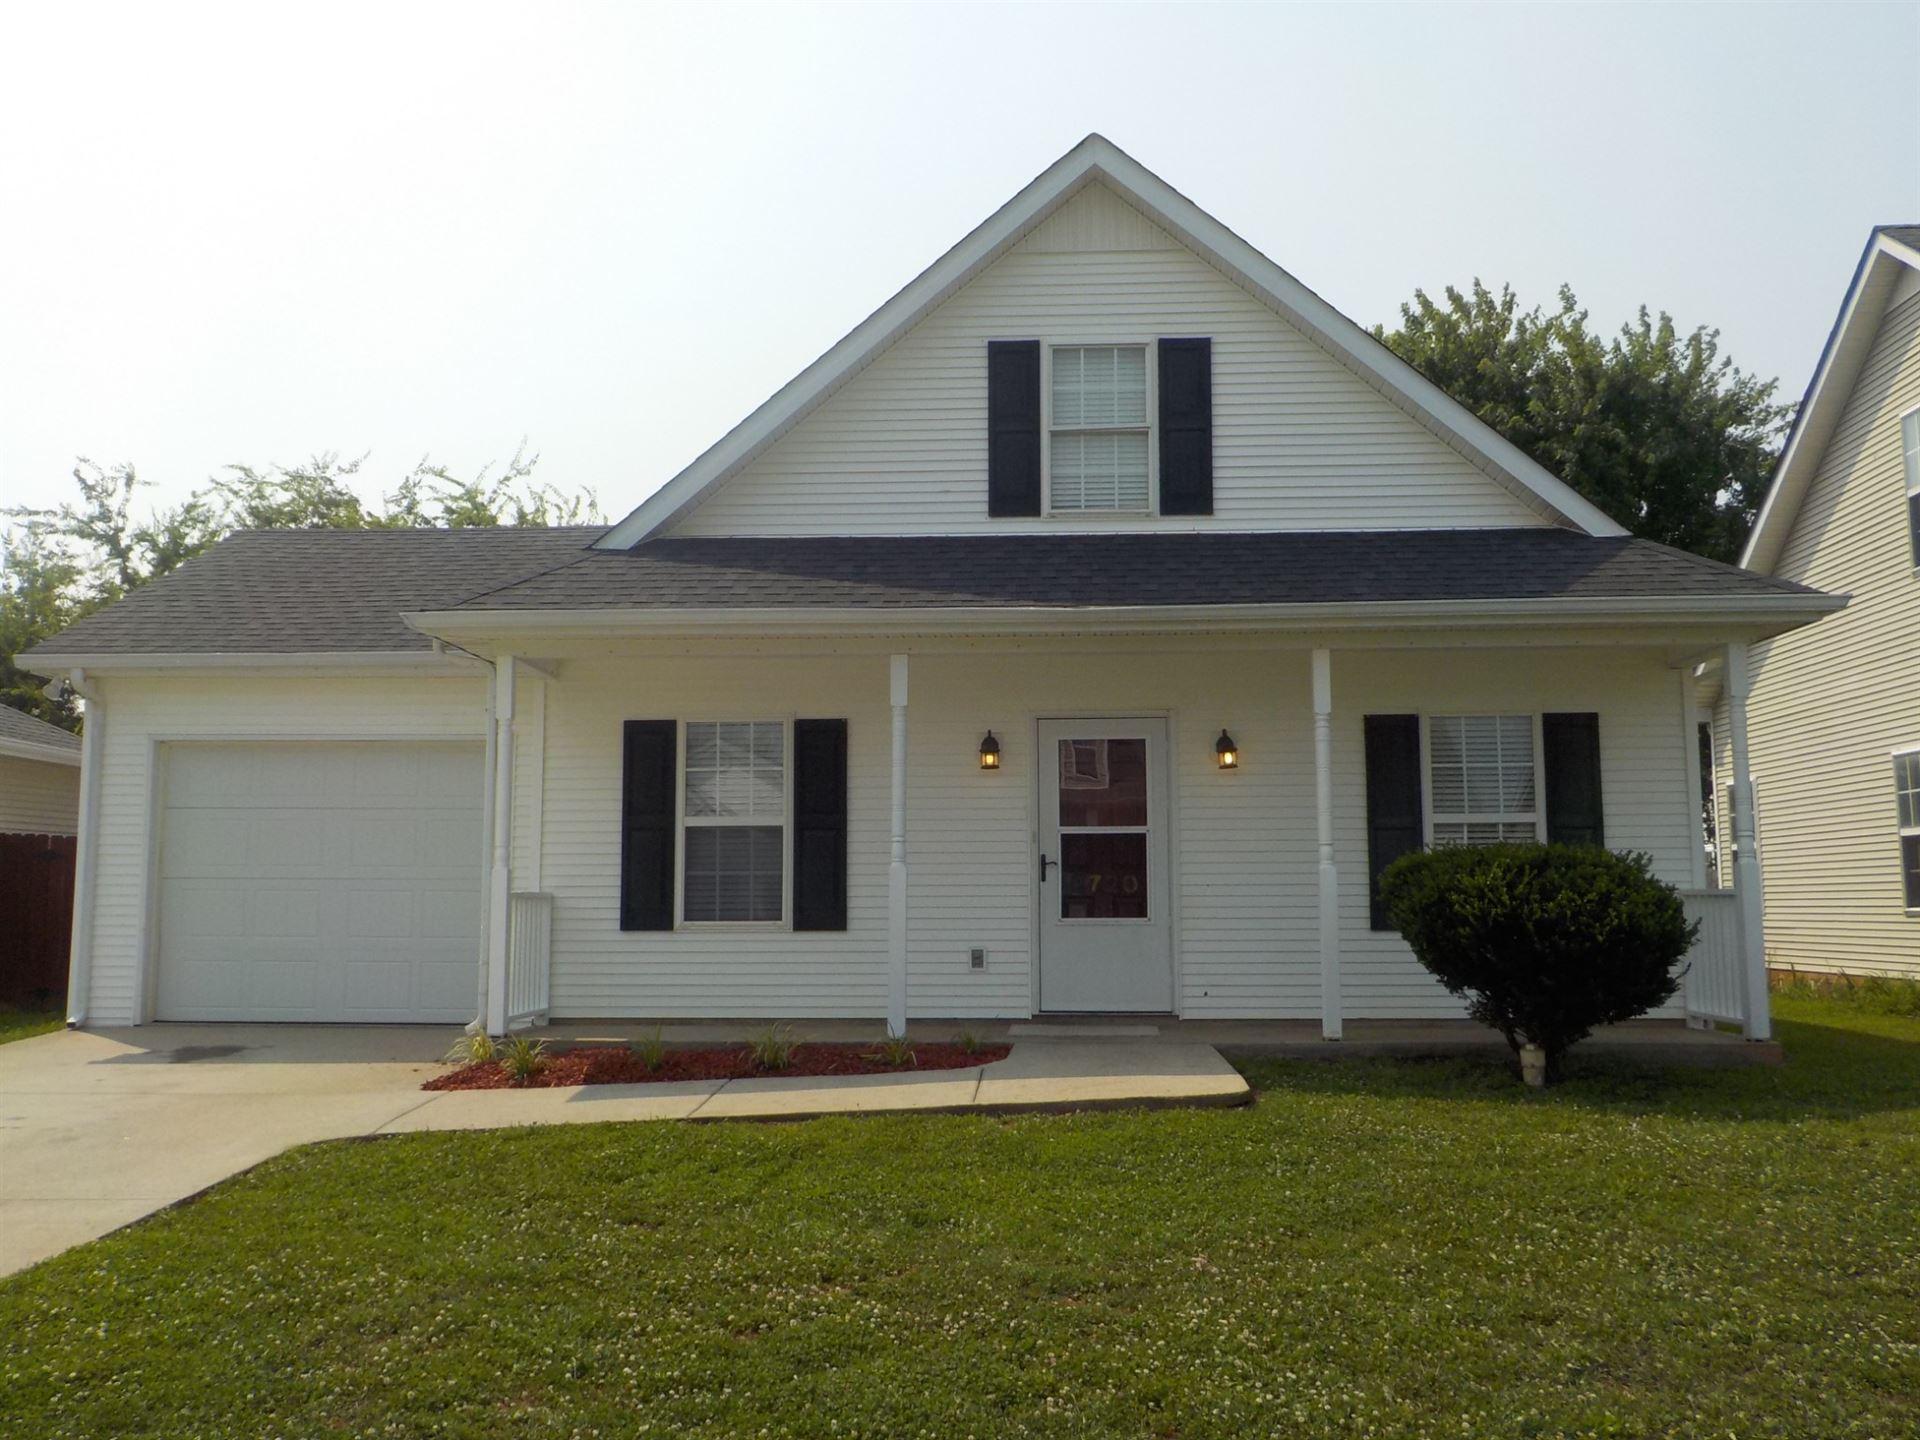 2720 Pepperdine Dr, Murfreesboro, TN 37128 - MLS#: 2275073